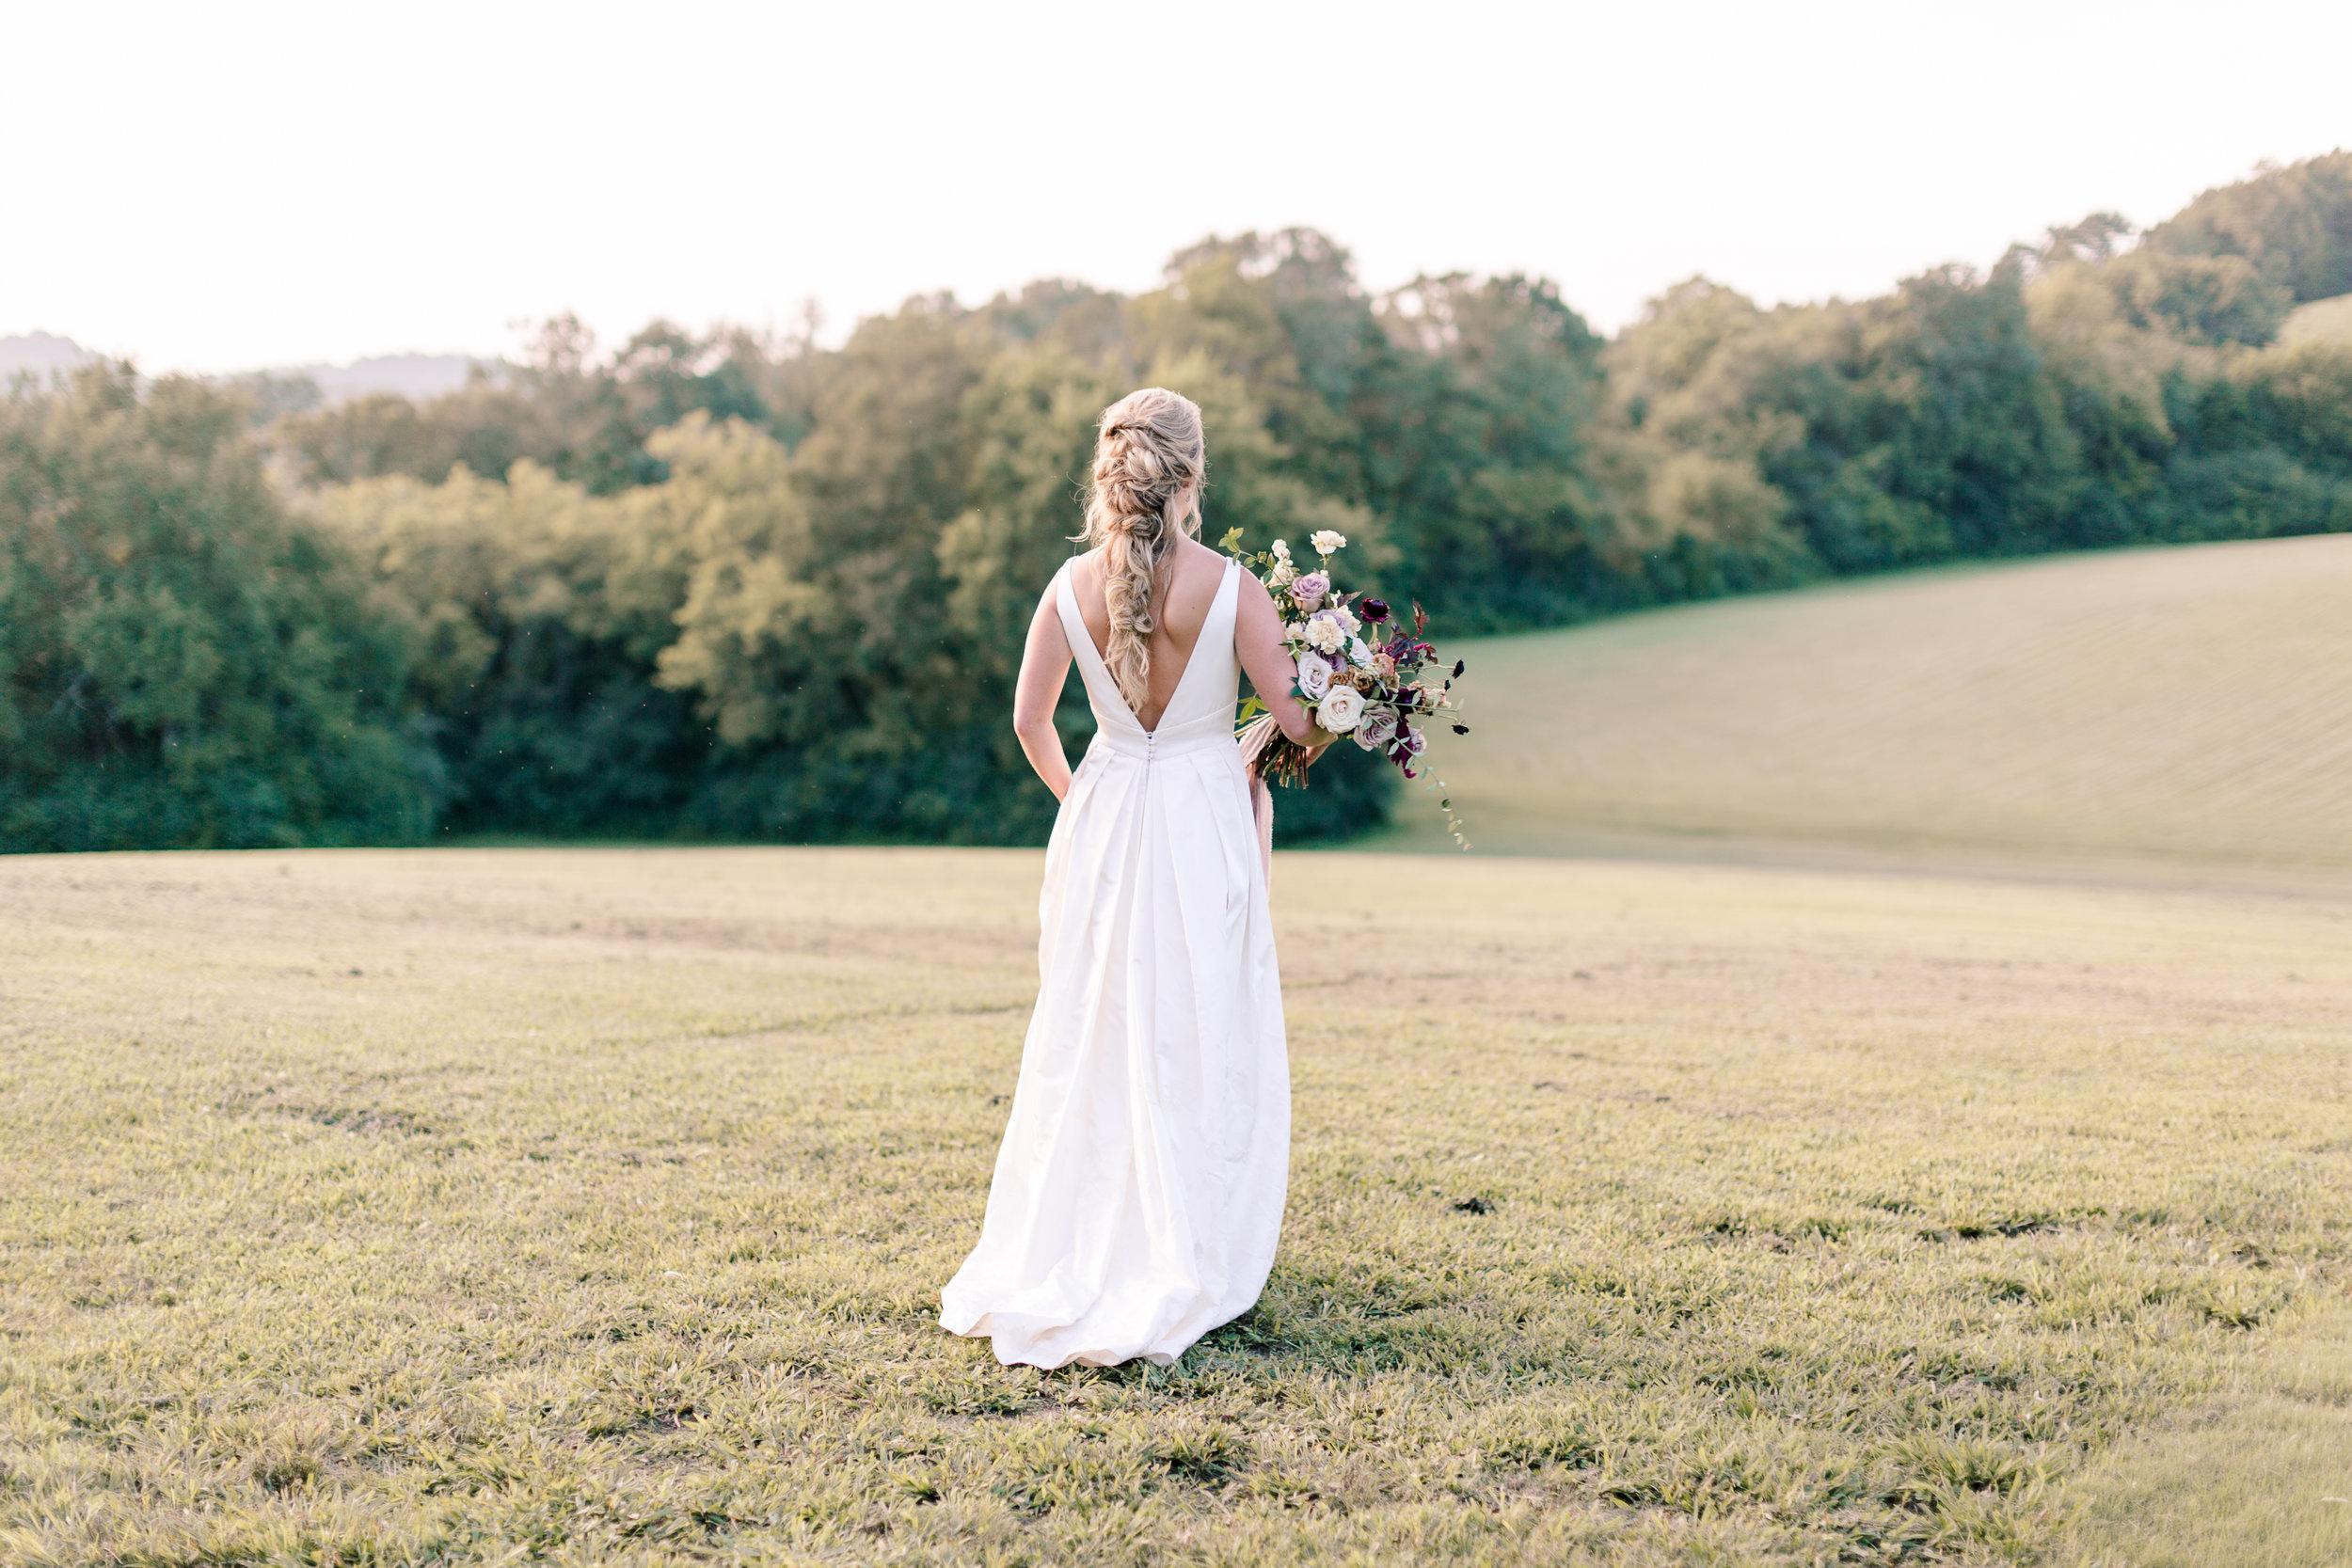 Sacred-Stone-Wedding-Mauve-Shoot-Ais-Portraits-252.jpg